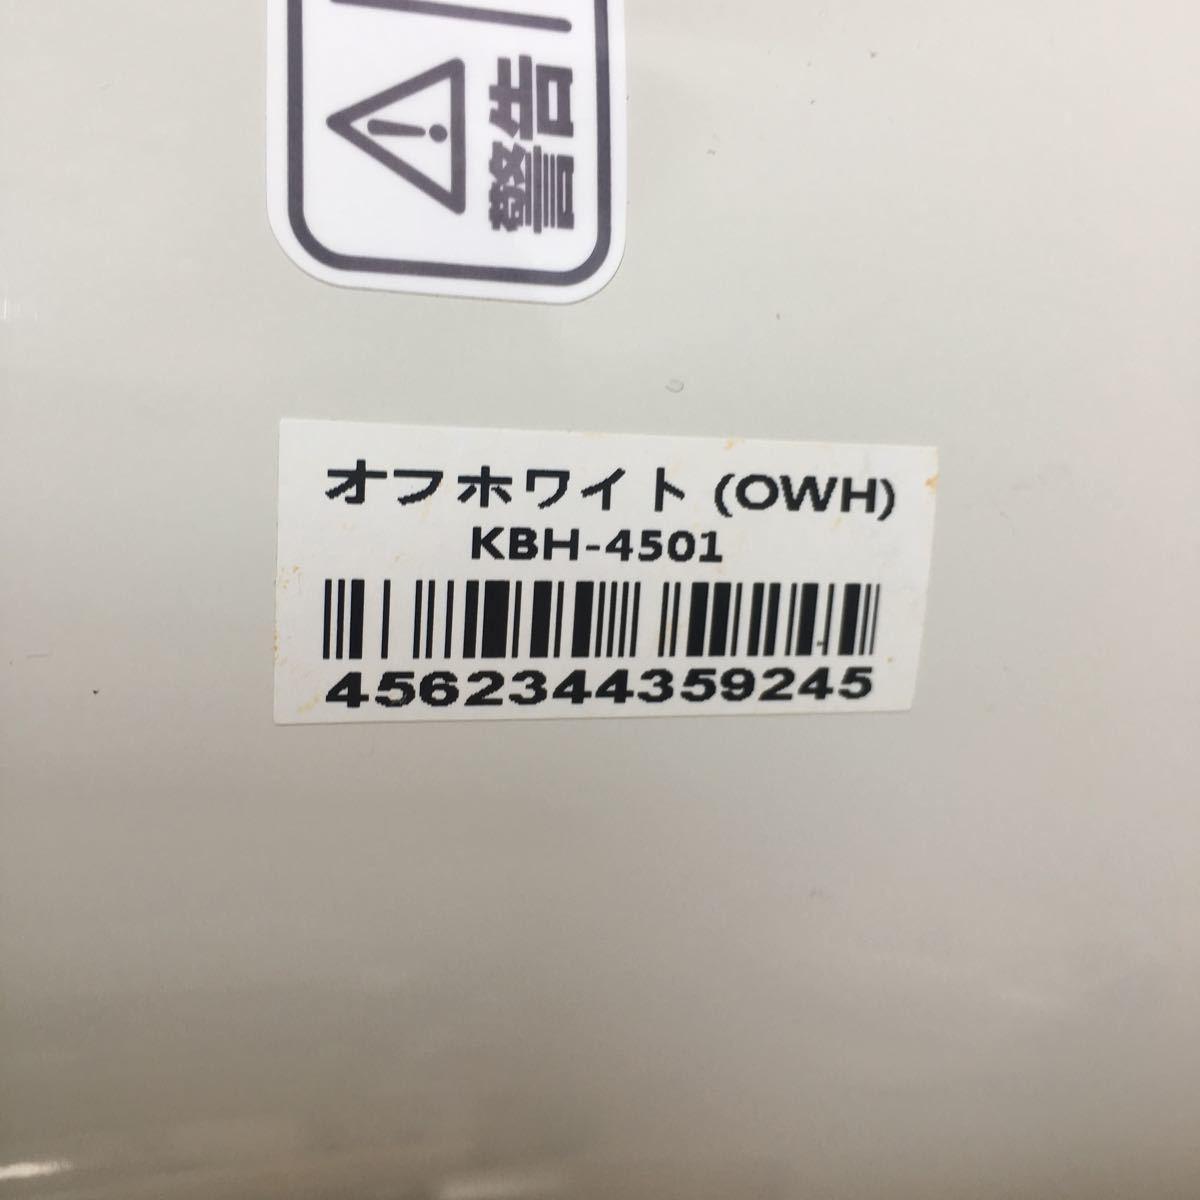 (H187)美品 THERMOS/サーモス 真空保温調理器 シャトルシェフ KBH-4501( OWH)_画像8